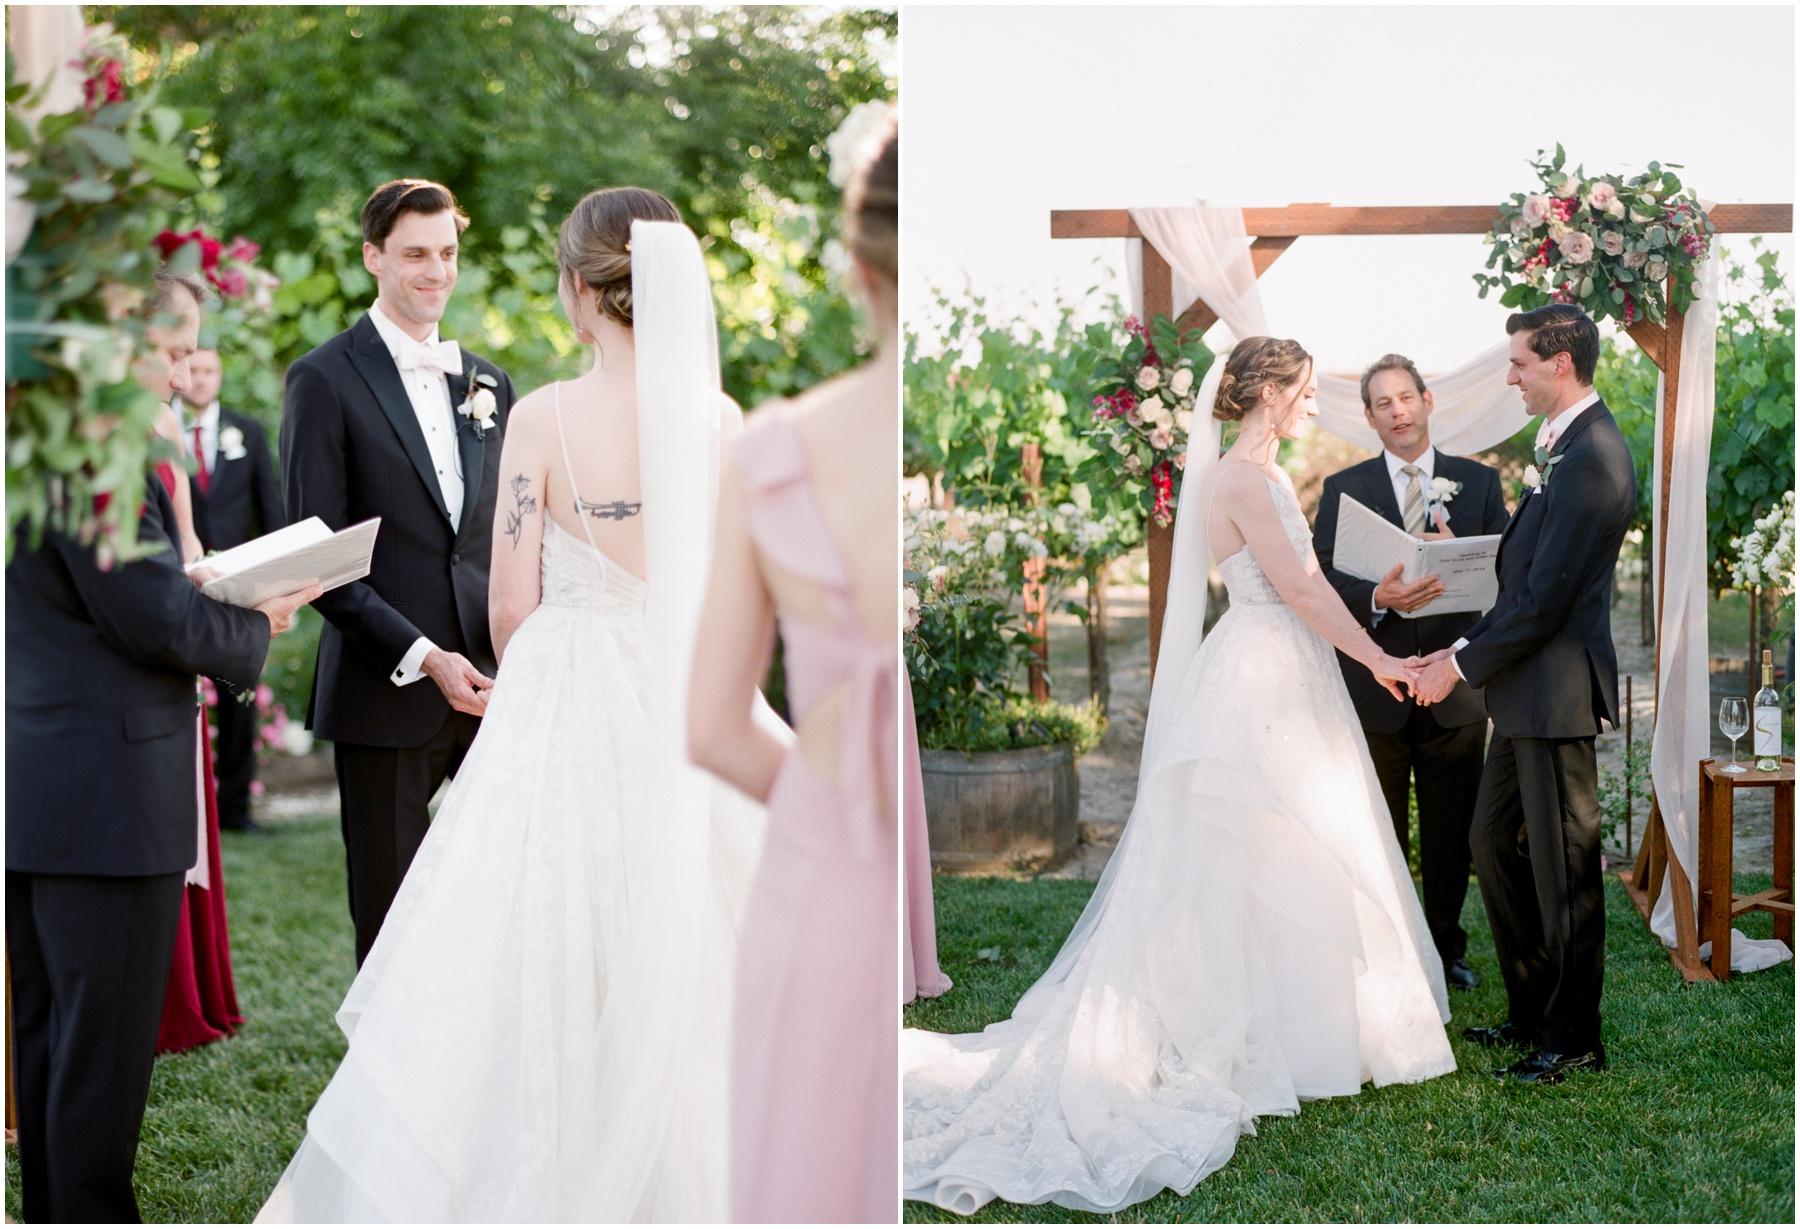 Scribner-bend-vineyards-wedding-sacramento-california-Kristine-Herman-Photography-2.jpg